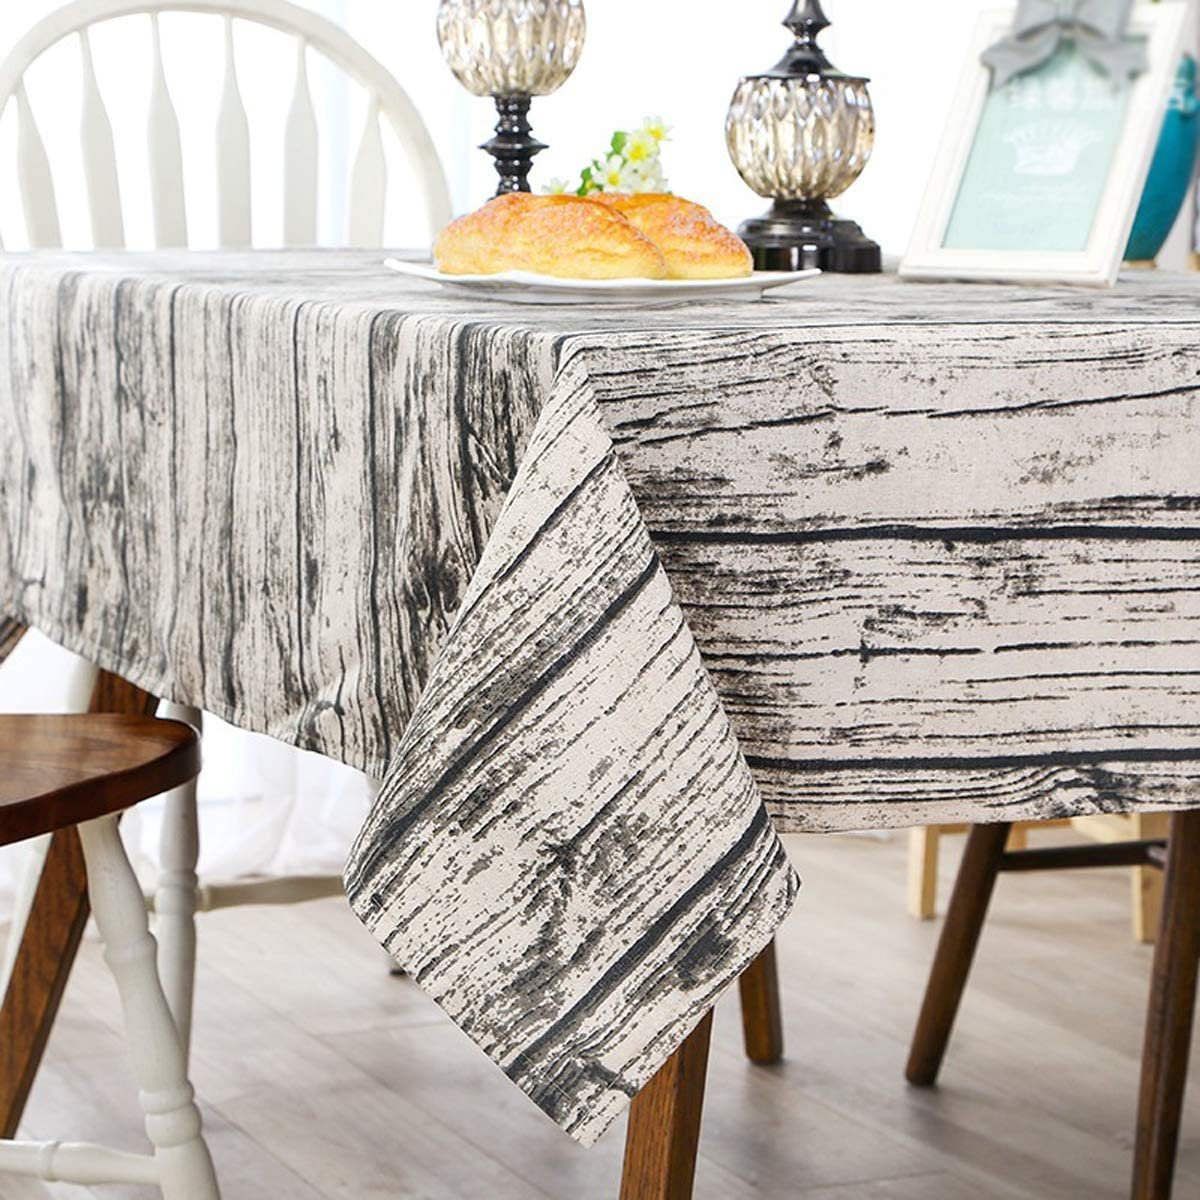 Bringsine Washable Cotton Linen Vintage Wooden Grain Pattern Design Square Tablecloth Dinner Picnic Table Cloth Cover Home Decoration(Square, 24 x 24 Inch)